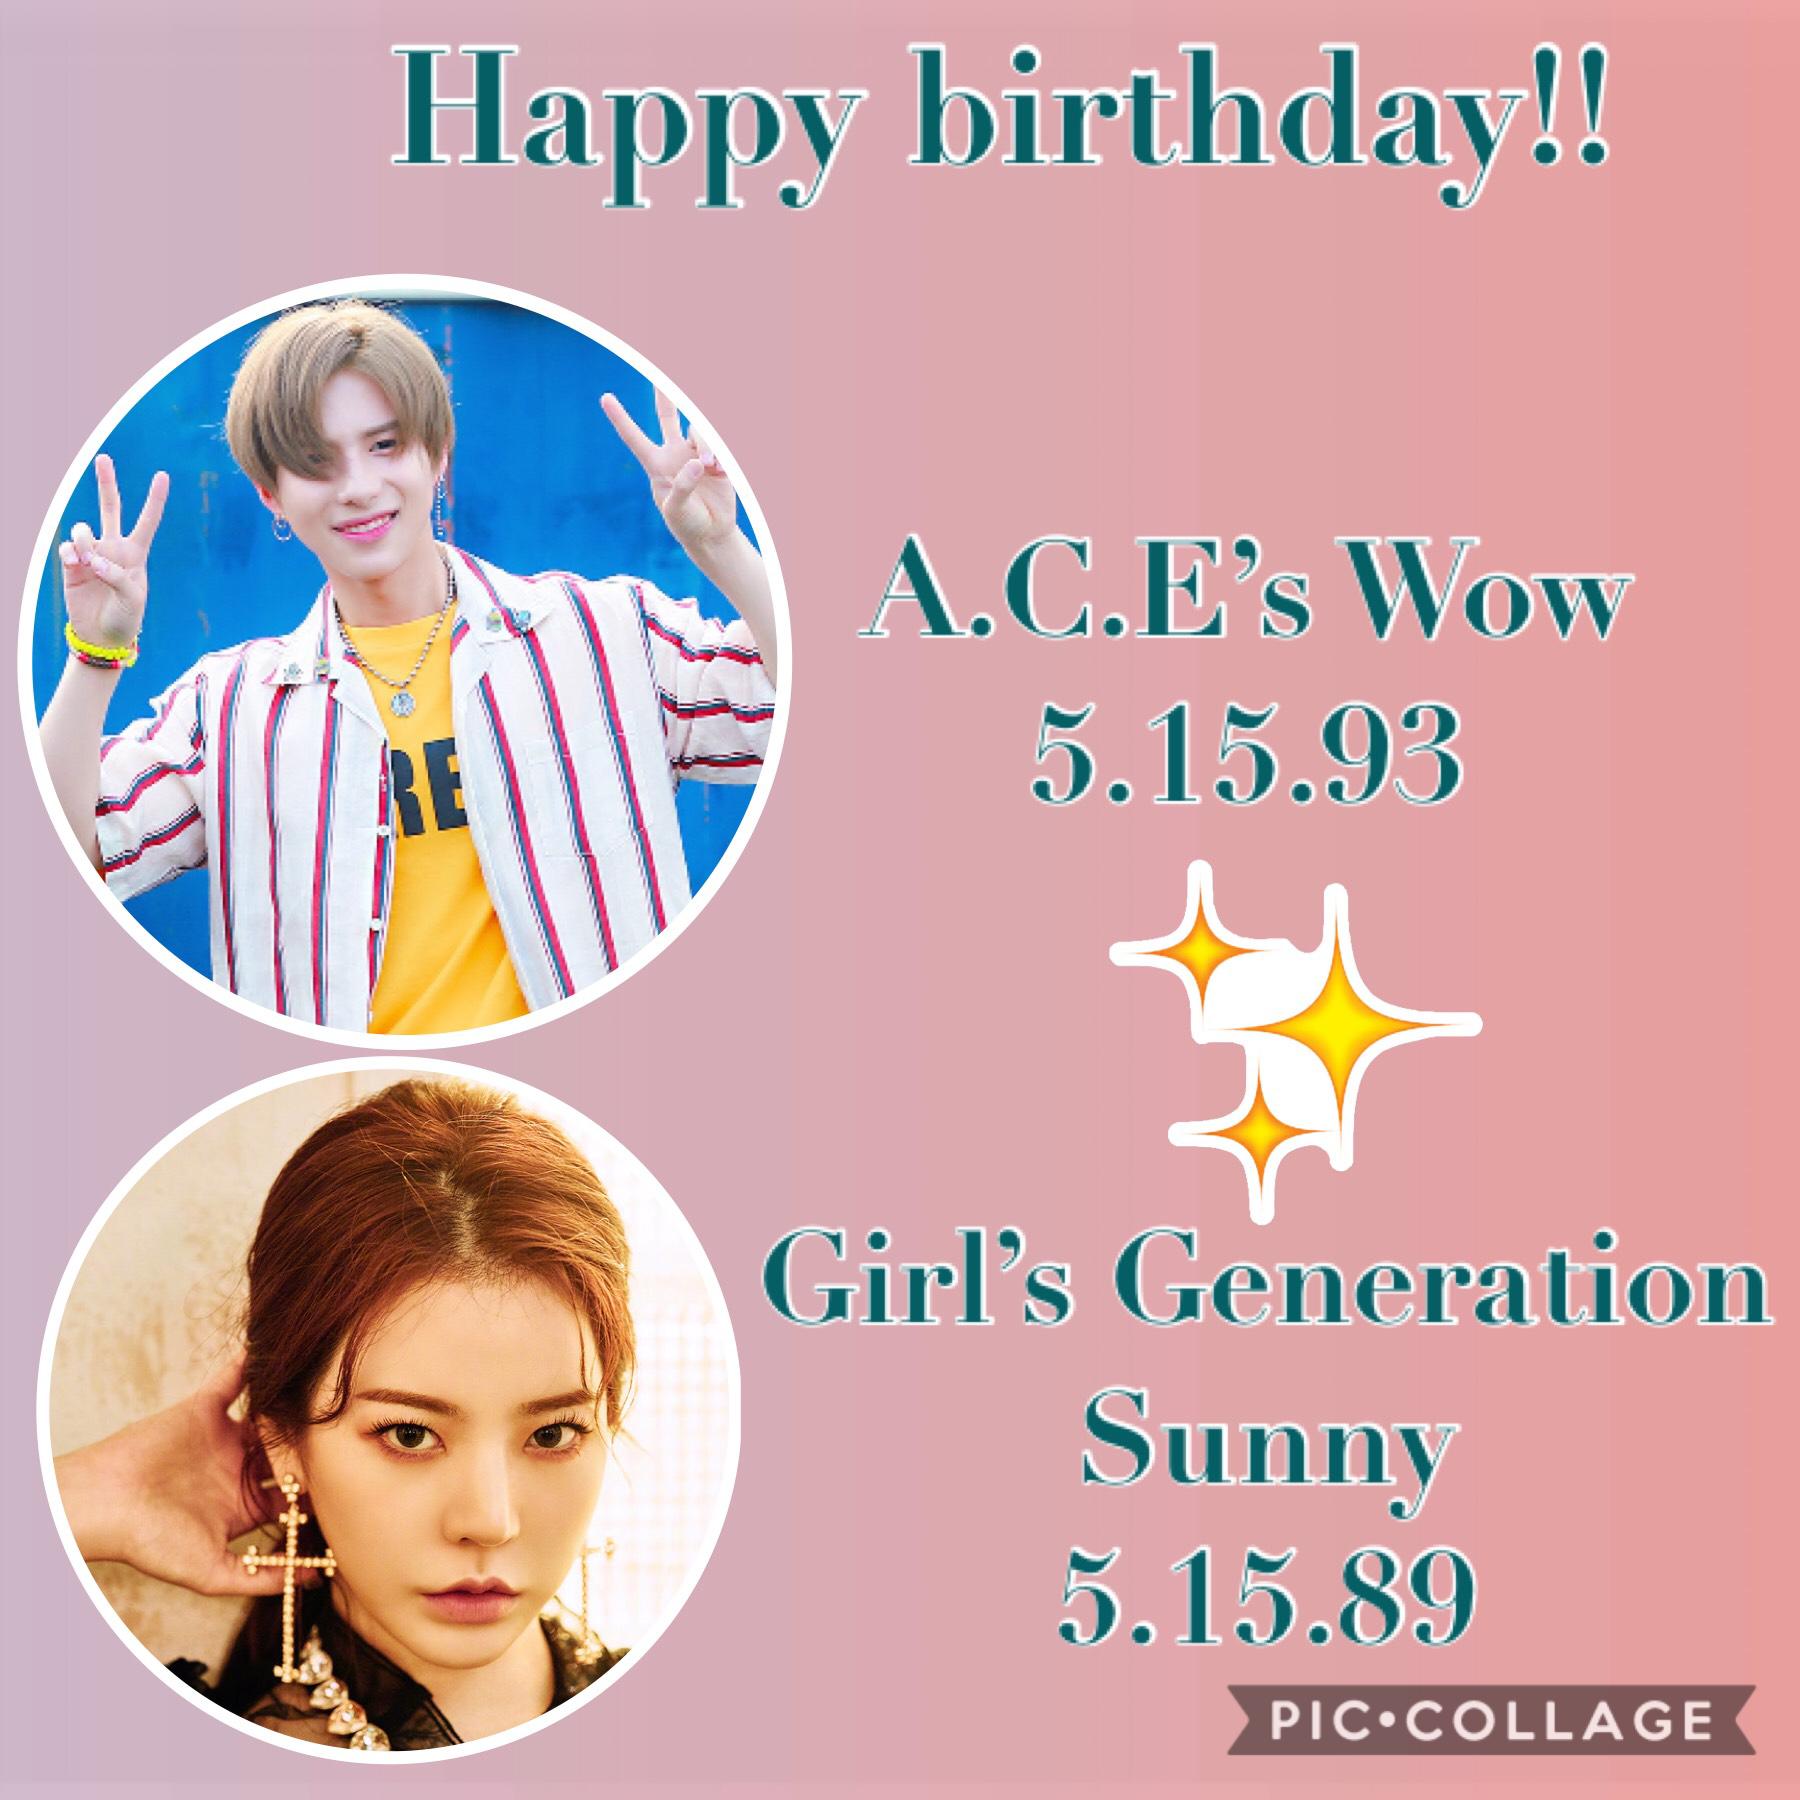 •🌷🎈• Happy birthday!💞 Other birthdays: •CNBLUE's JongHyun  •IU~May 16 •DreamCatcher's Jiu~ May 17 •EVERGLOW's Onda~ May 18 •BigBang's Taeyang~May 18 •EVERGLOW's E:U~ May 19 •Nu'est's Aron~ May 21 🌹🌷🌹🌷🌹🌷🌹